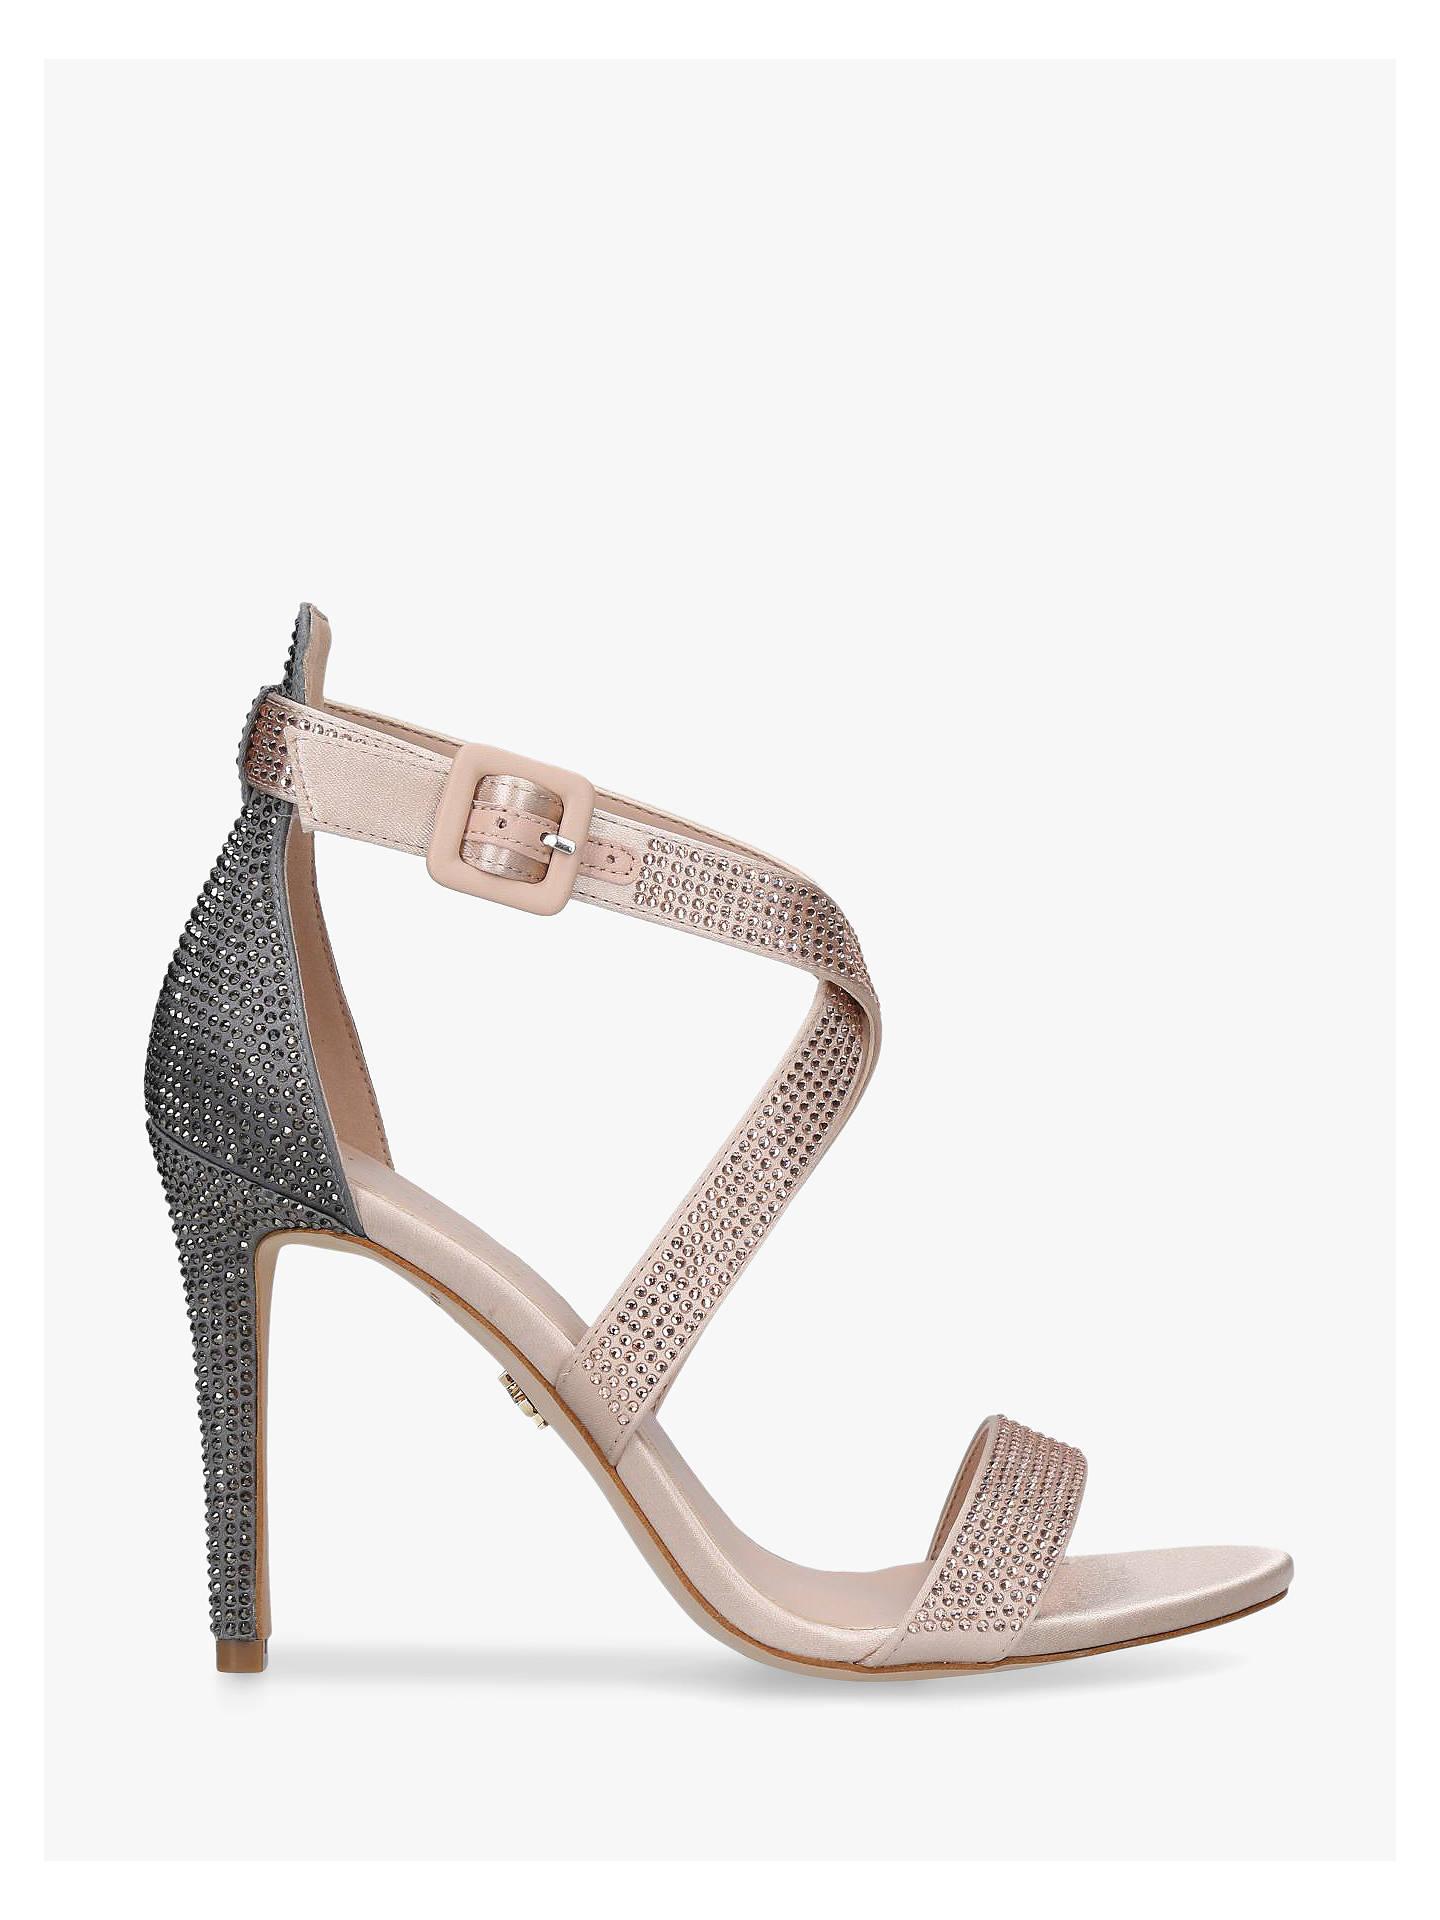 21105536b19 Kurt Geiger London Knightsbridge Crystal Stiletto Heel Sandals, Nude/Grey  Satin